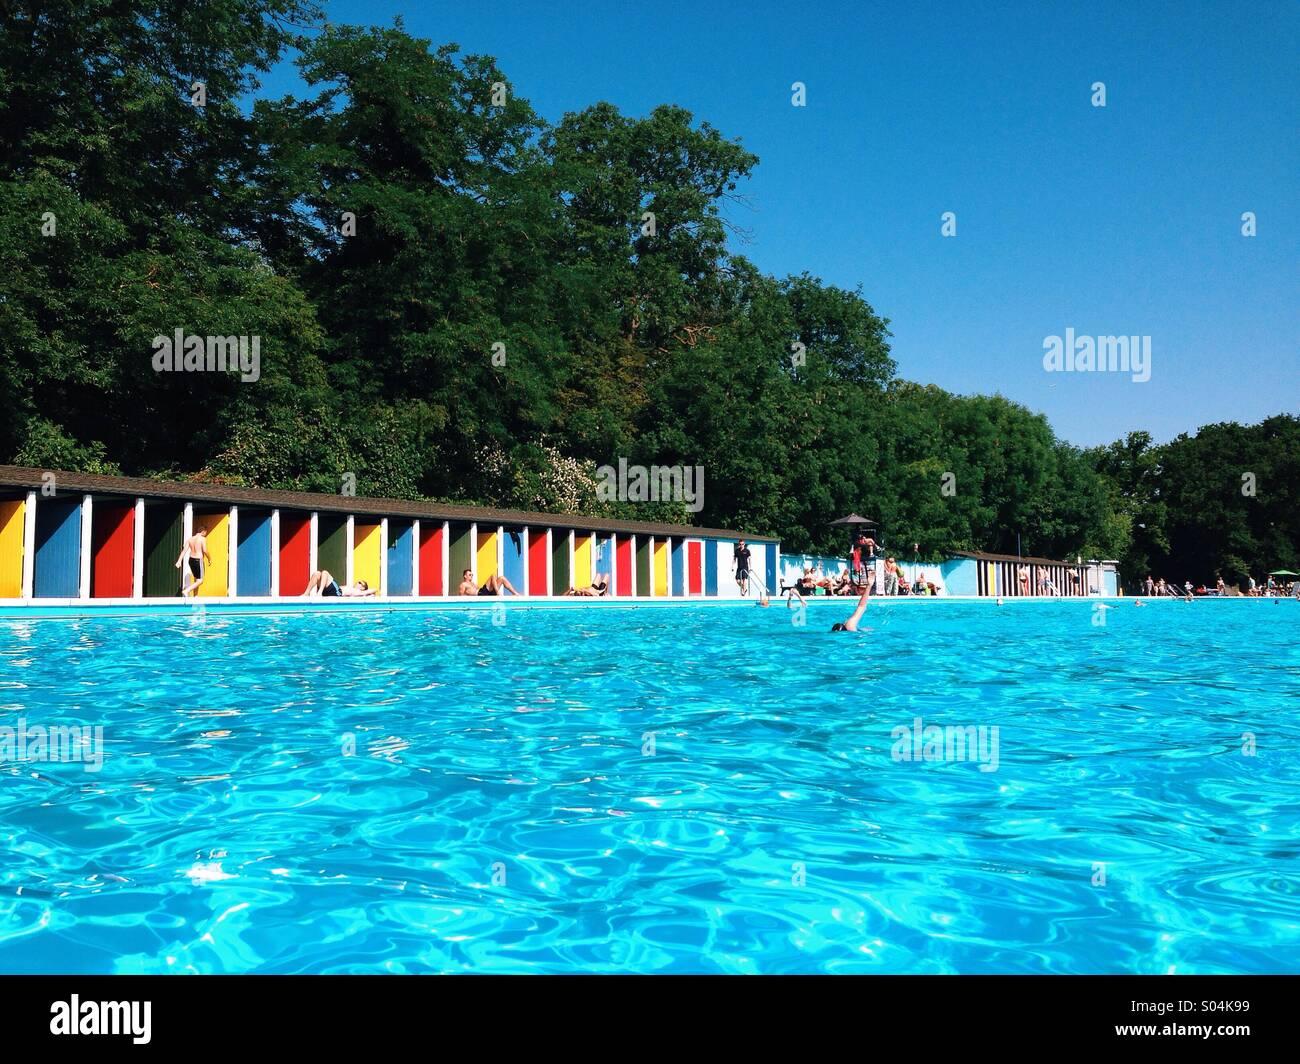 Tooting Lido. Outdoor pool. - Stock Image